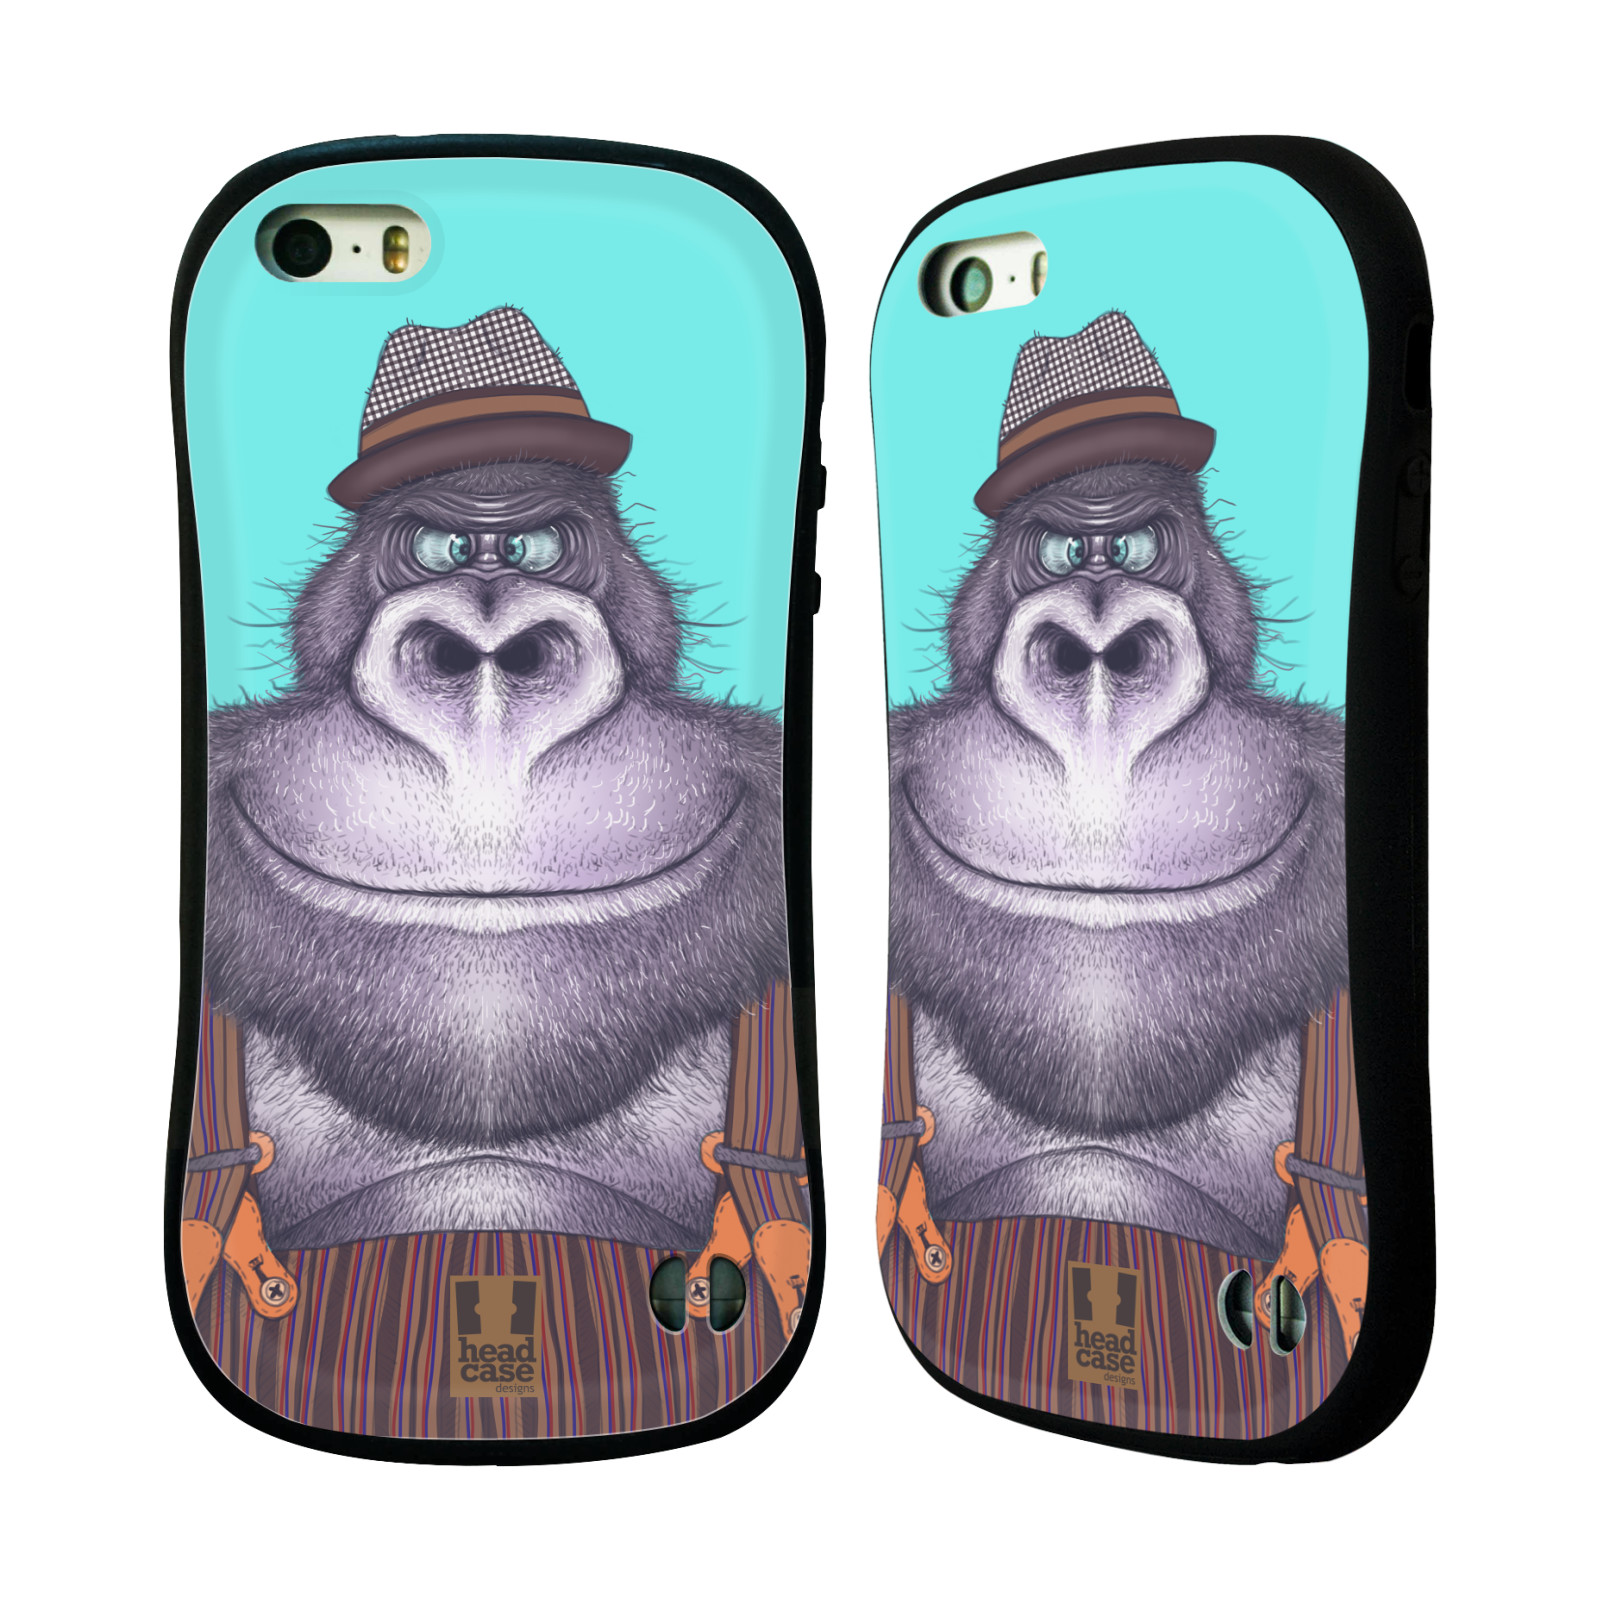 HEAD CASE silikon/plast odolný obal na mobil Apple Iphone 5/5S vzor Kreslená zvířátka gorila